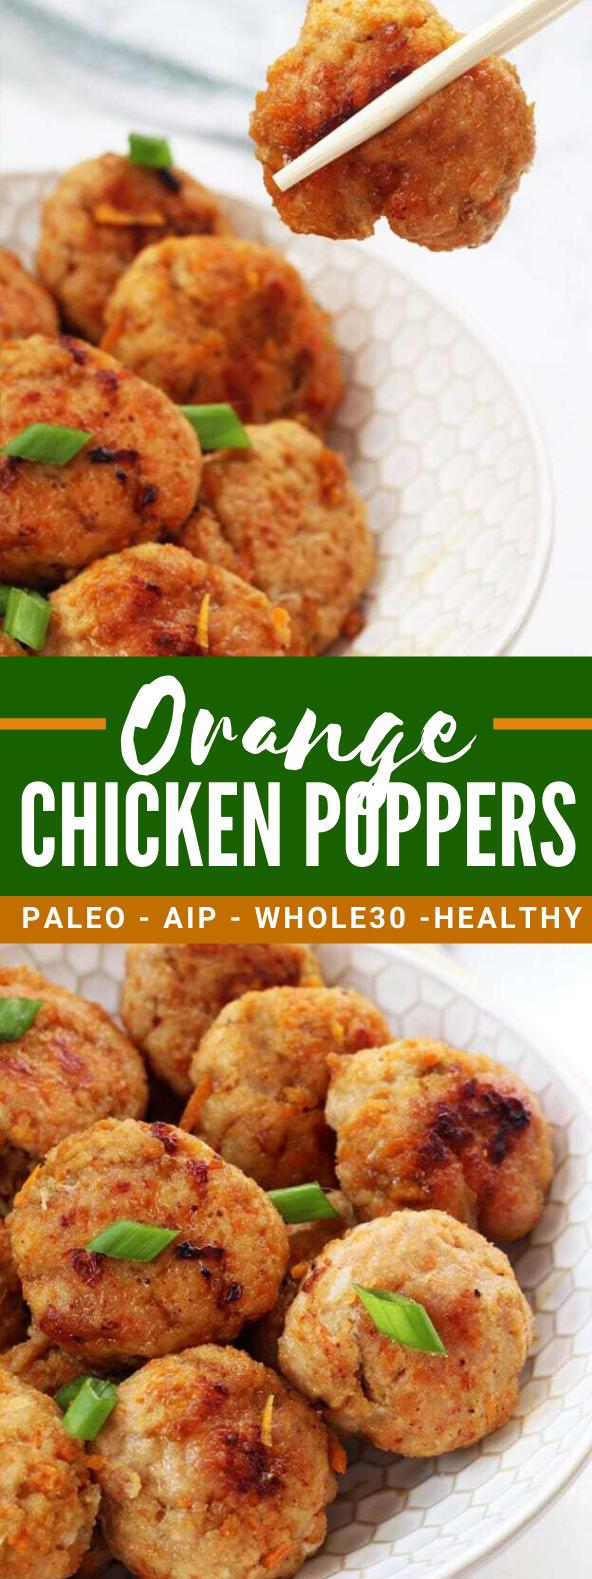 ORANGE CHICKEN POPPERS (PALEO, AIP, WHOLE 30) #healthy #diet